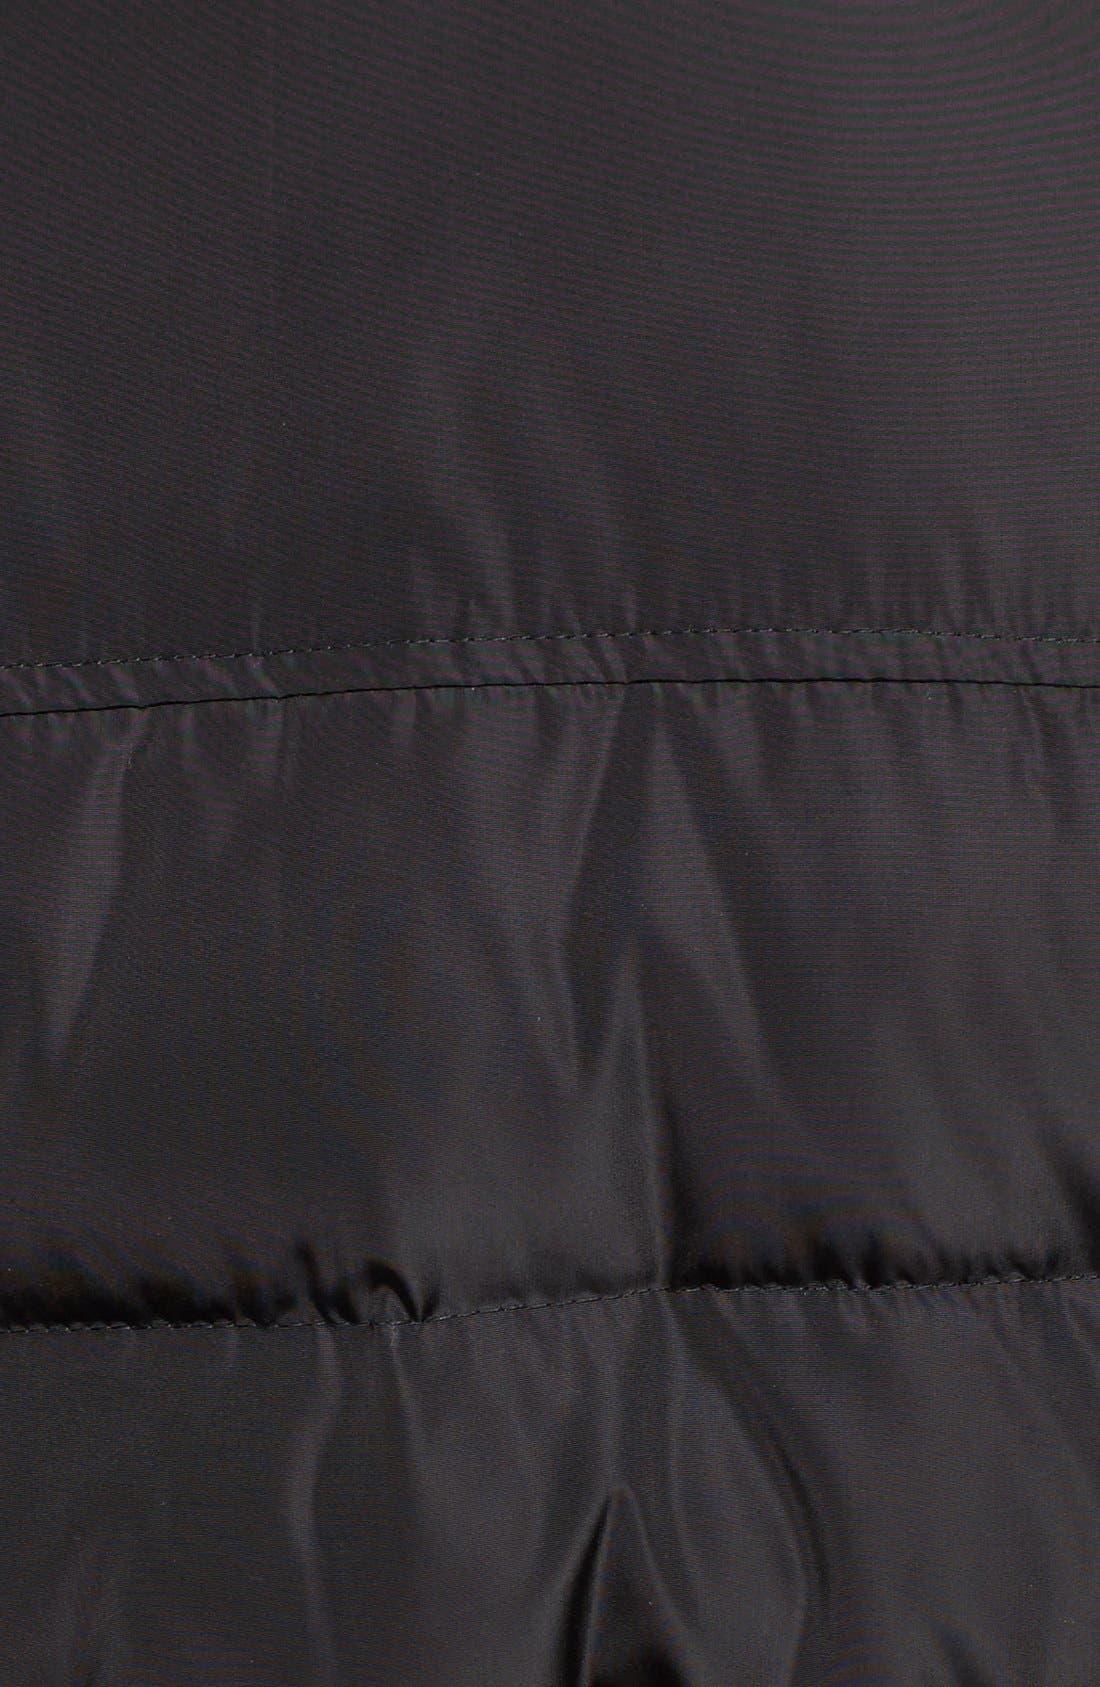 KORS MICHAEL KORS, Faux Fur Trim Belted Down & Feather Fill Maxi Coat, Alternate thumbnail 5, color, 001